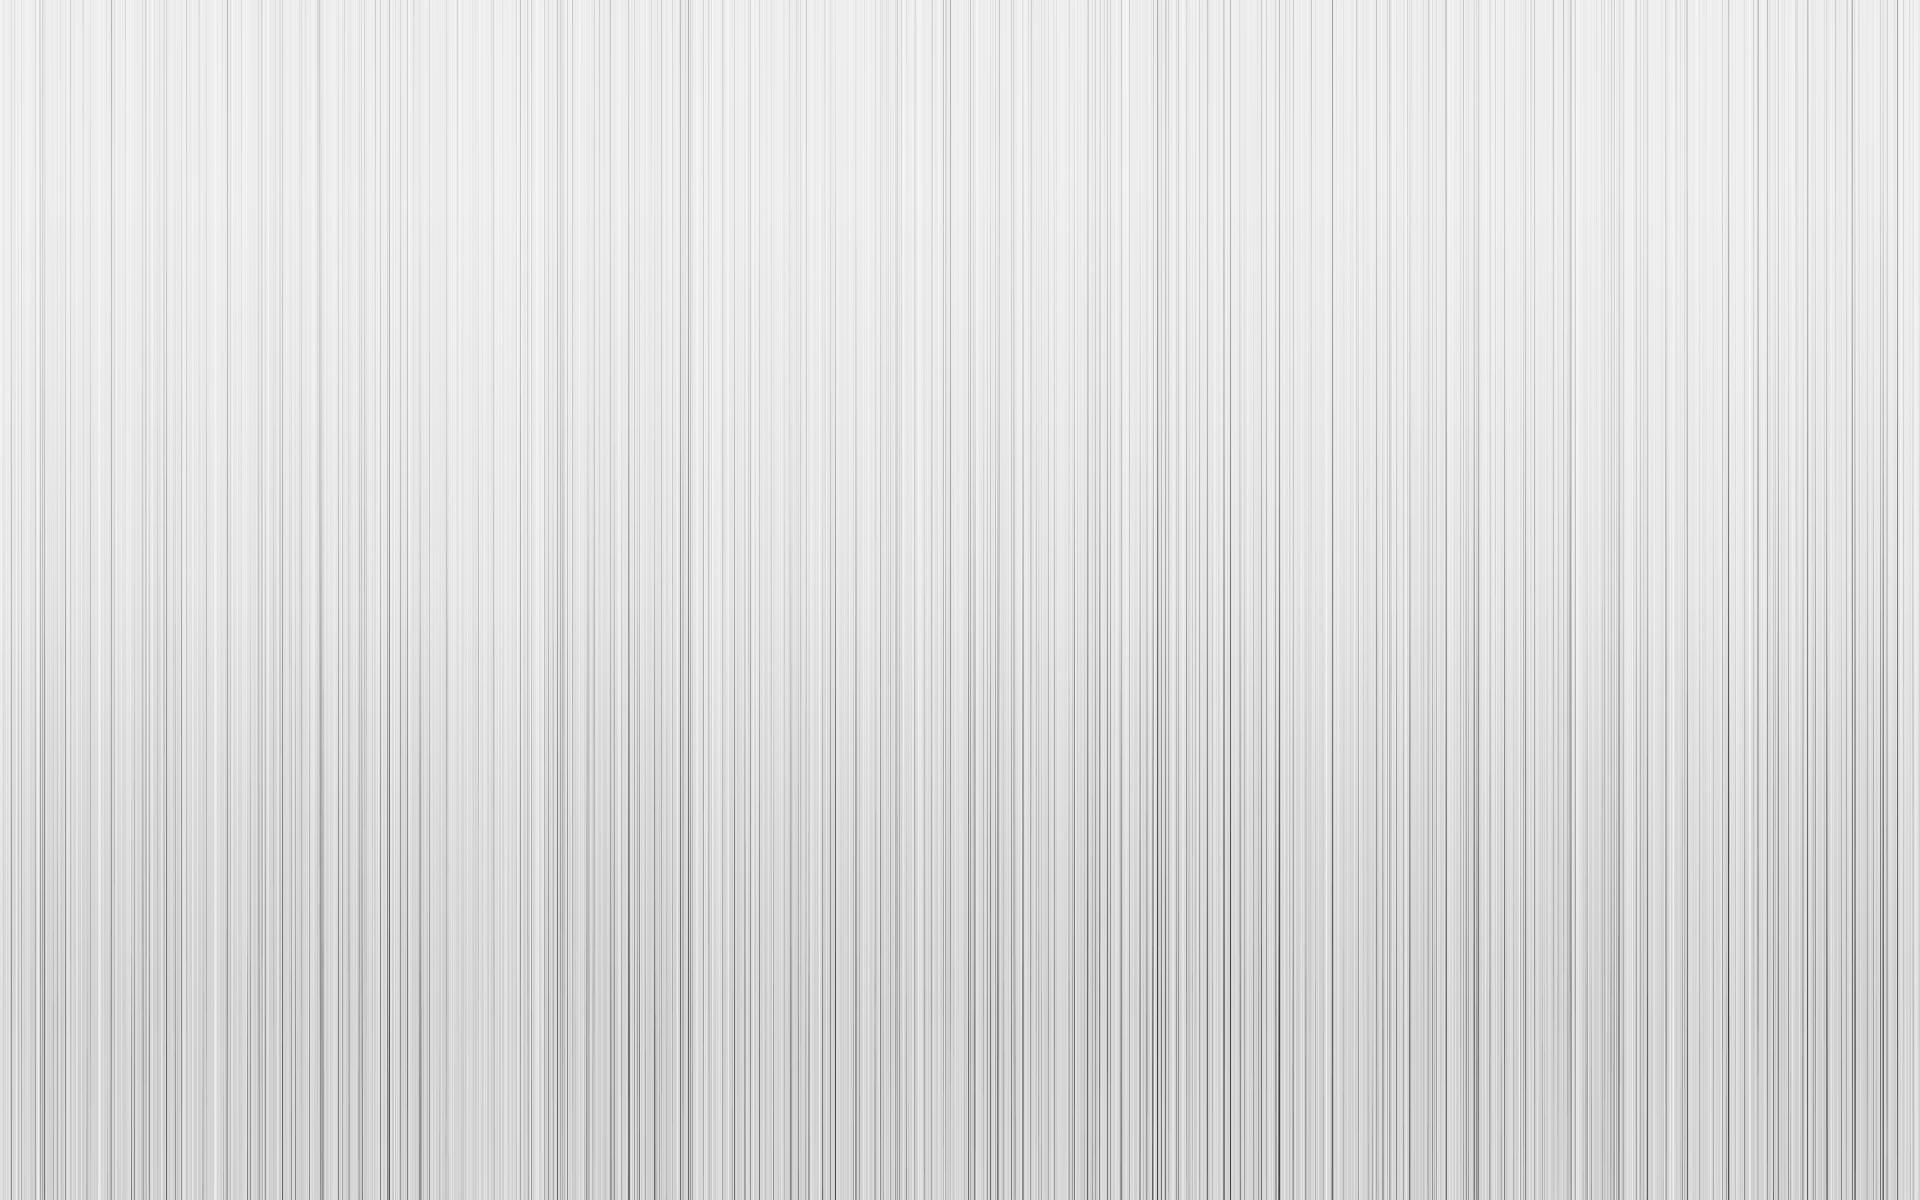 Wallpaper Smartphone 3d Grey Hd Wallpapers 67 Images